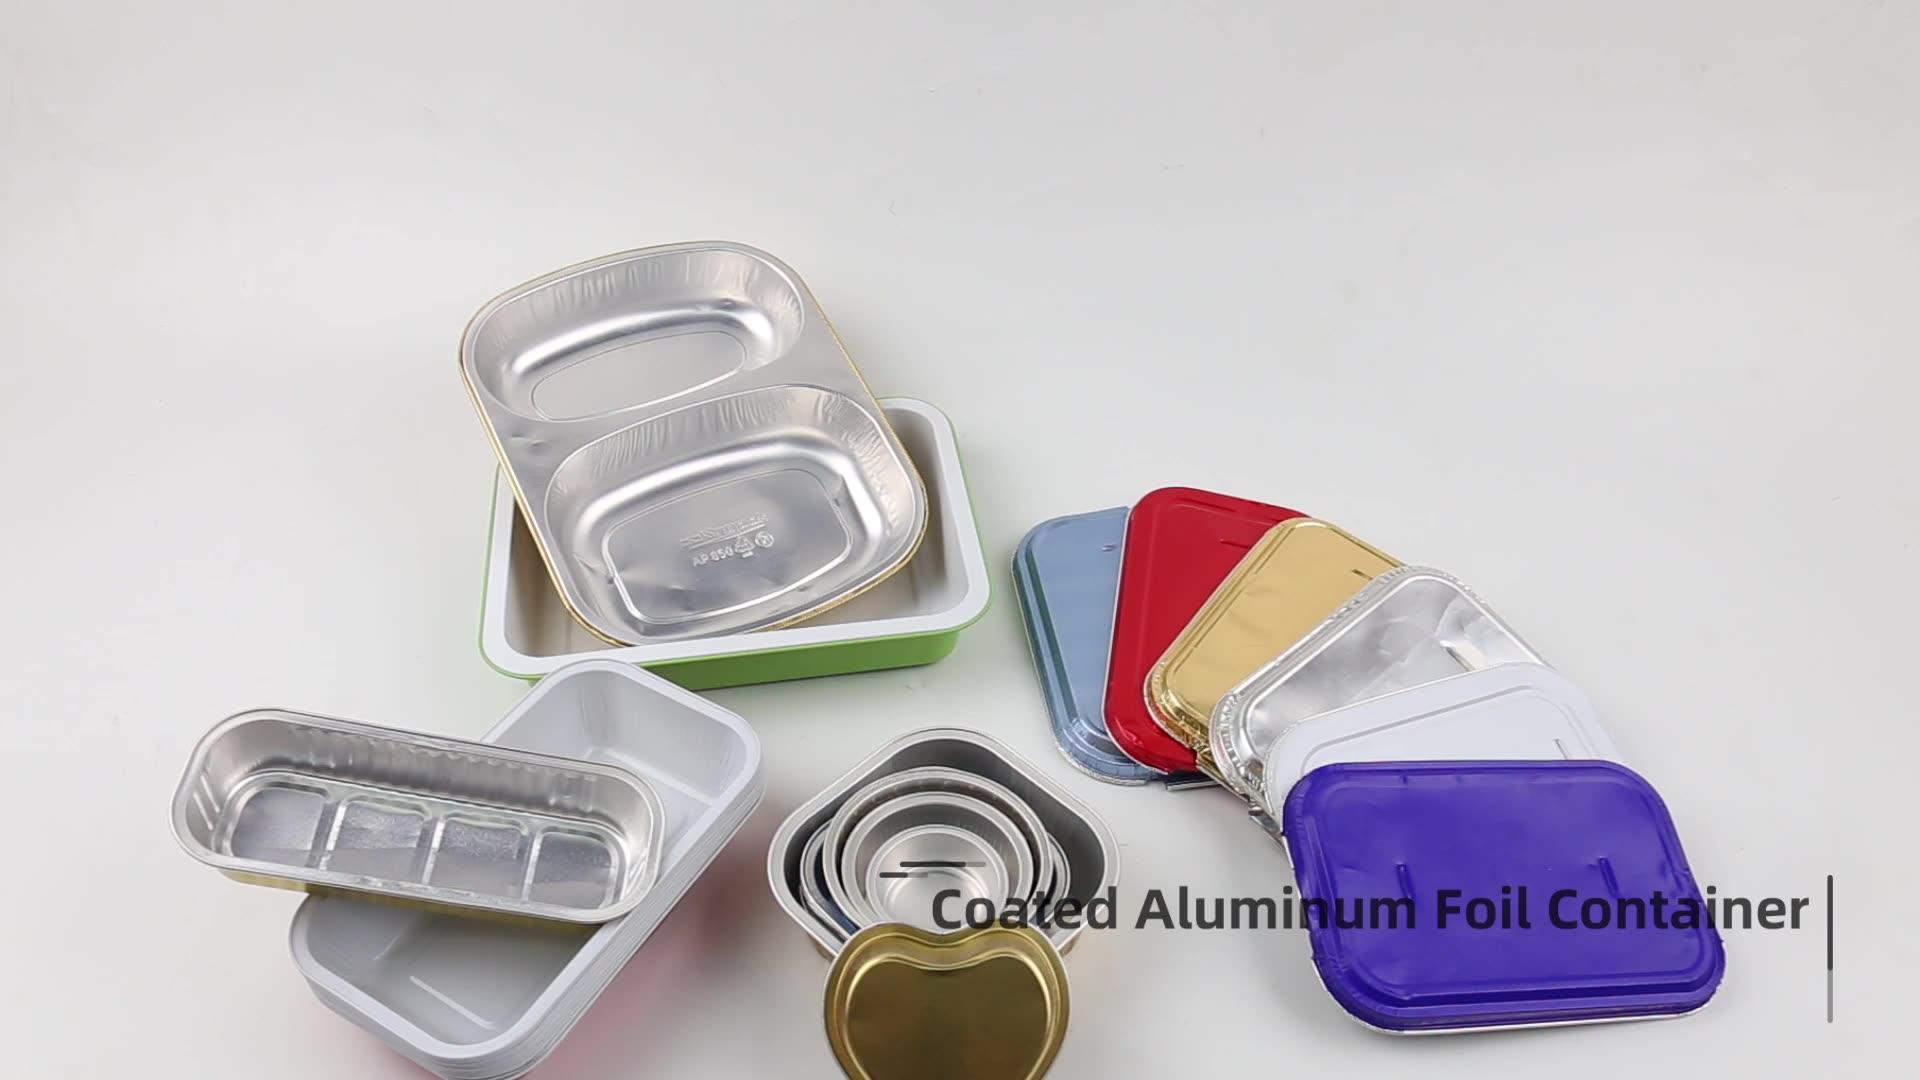 High Quality Nespresso Aluminum Foil Empty Coffee Capsule With Sticker Aluminum Foil Container